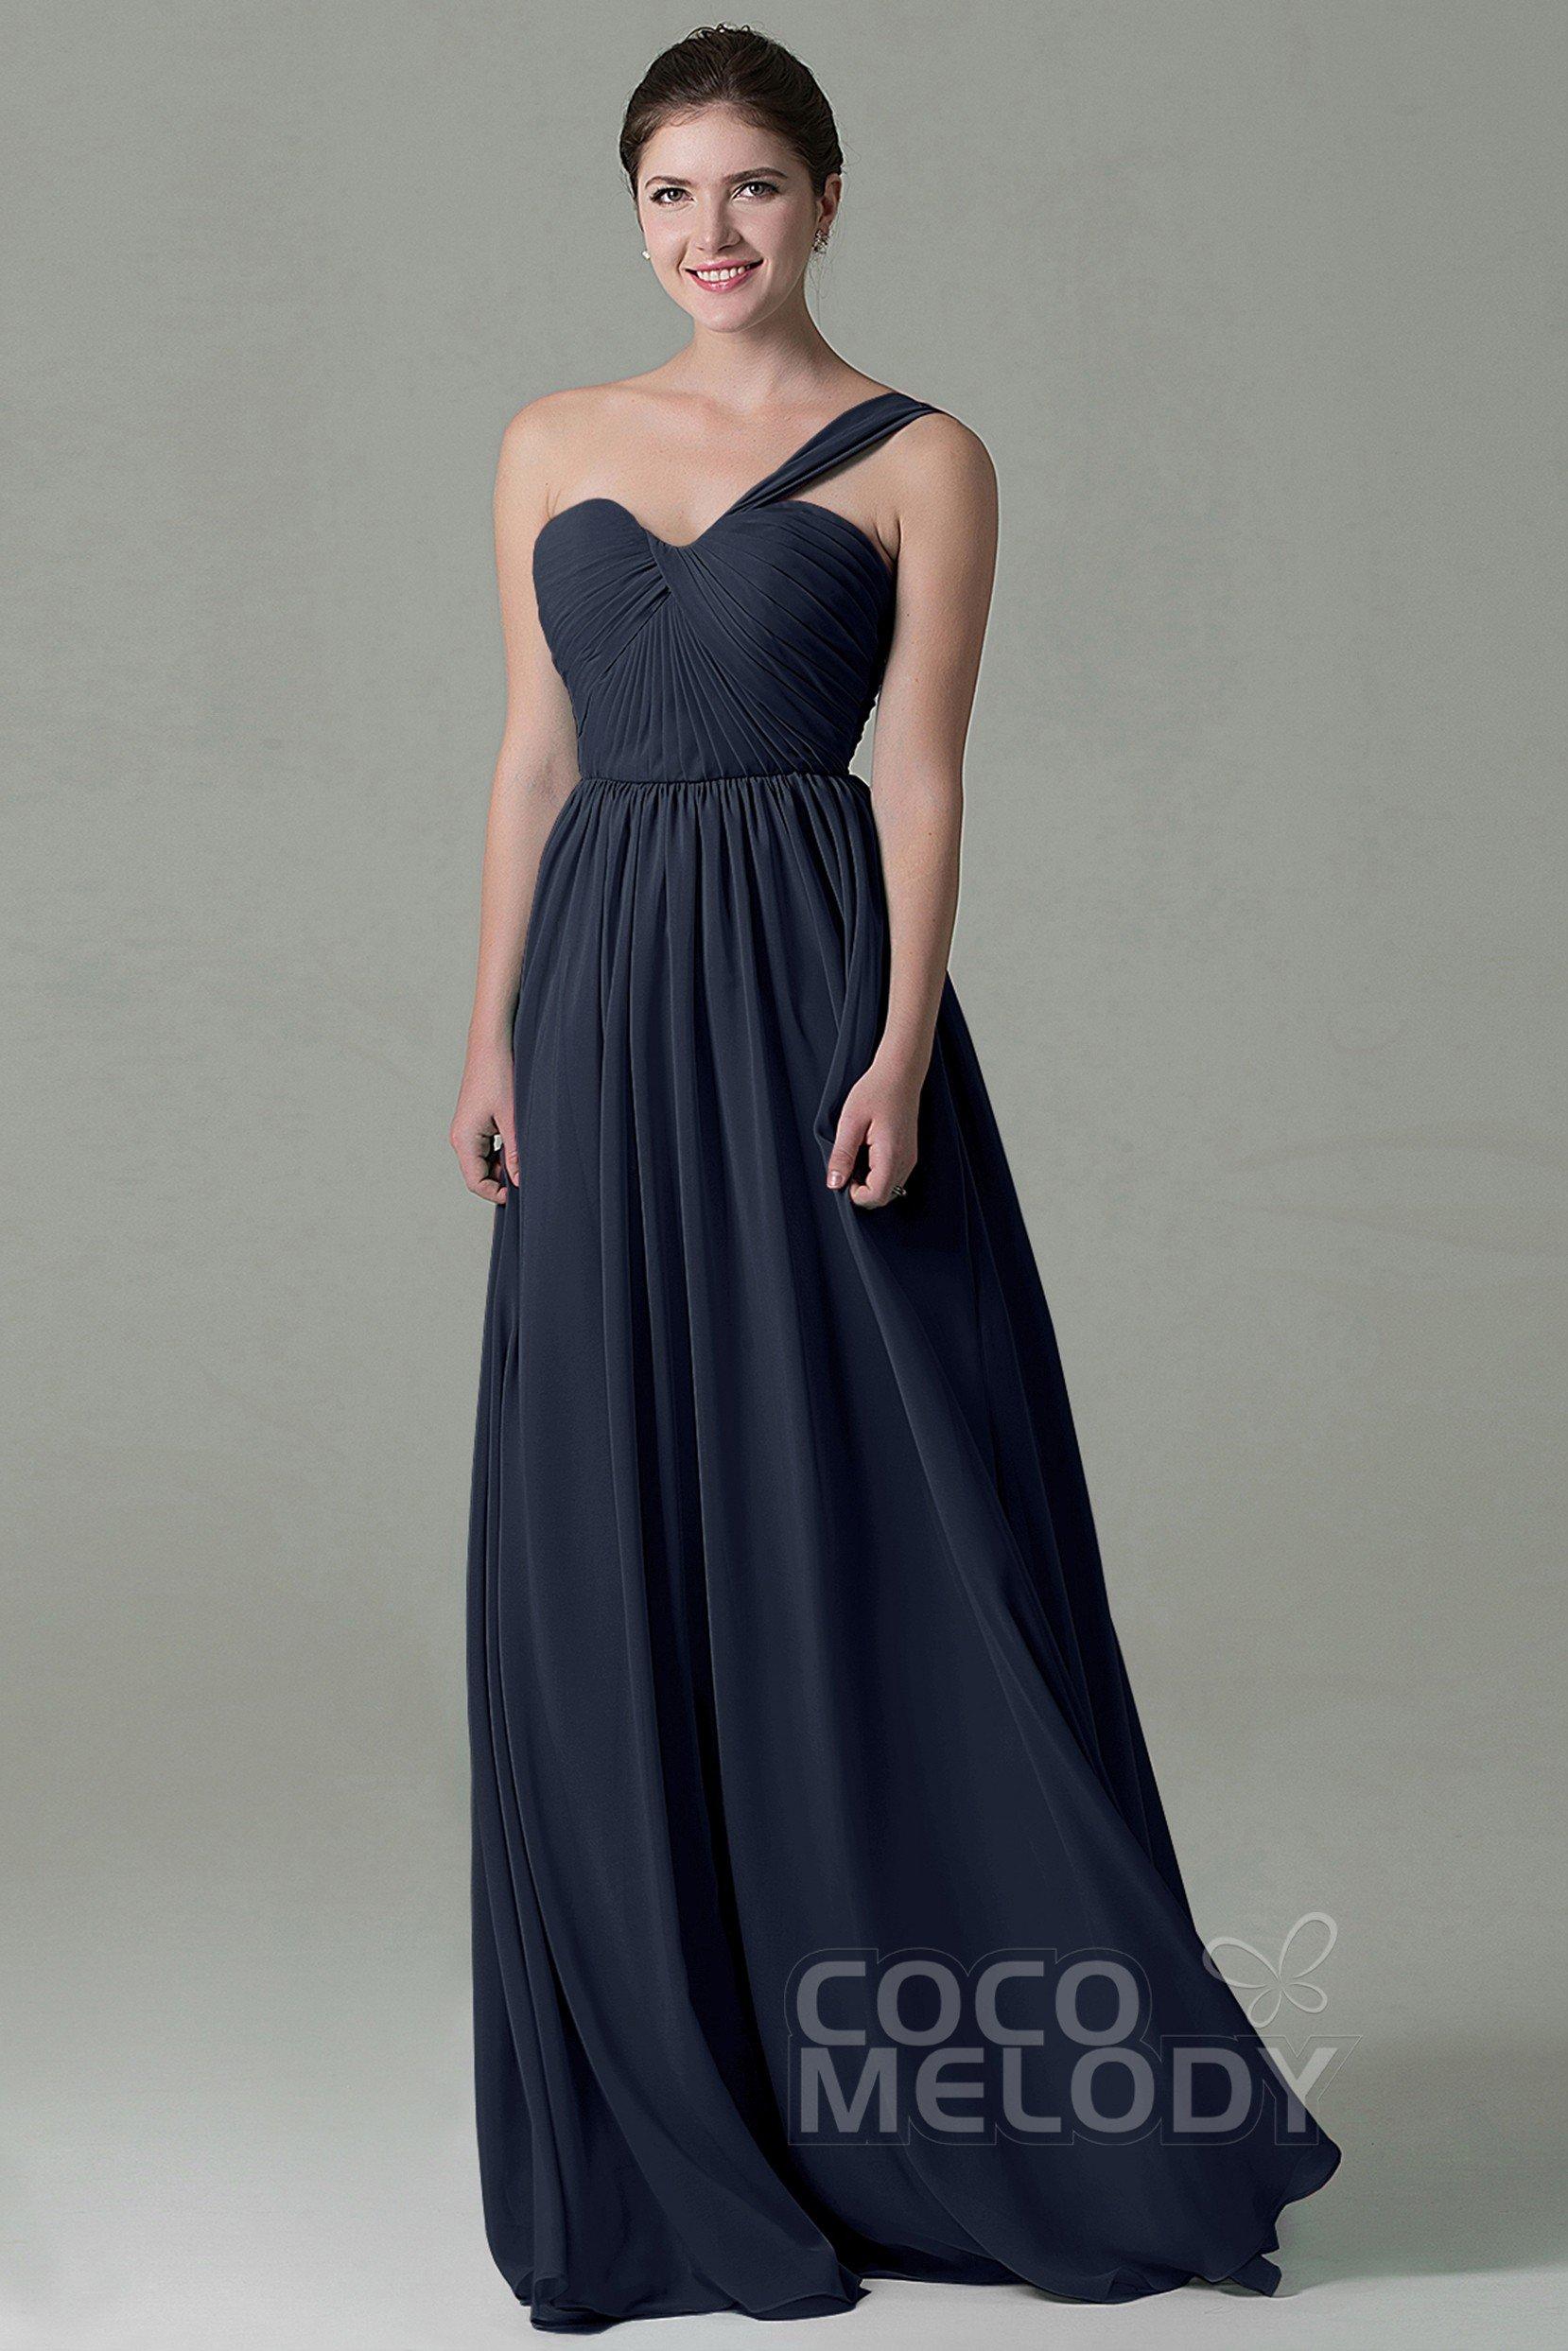 a4e5894d4783 Cute Sheath-Column One Shoulder Natural Floor Length Chiffon Sleeveless Lace  Up-Corset Bridesmaid